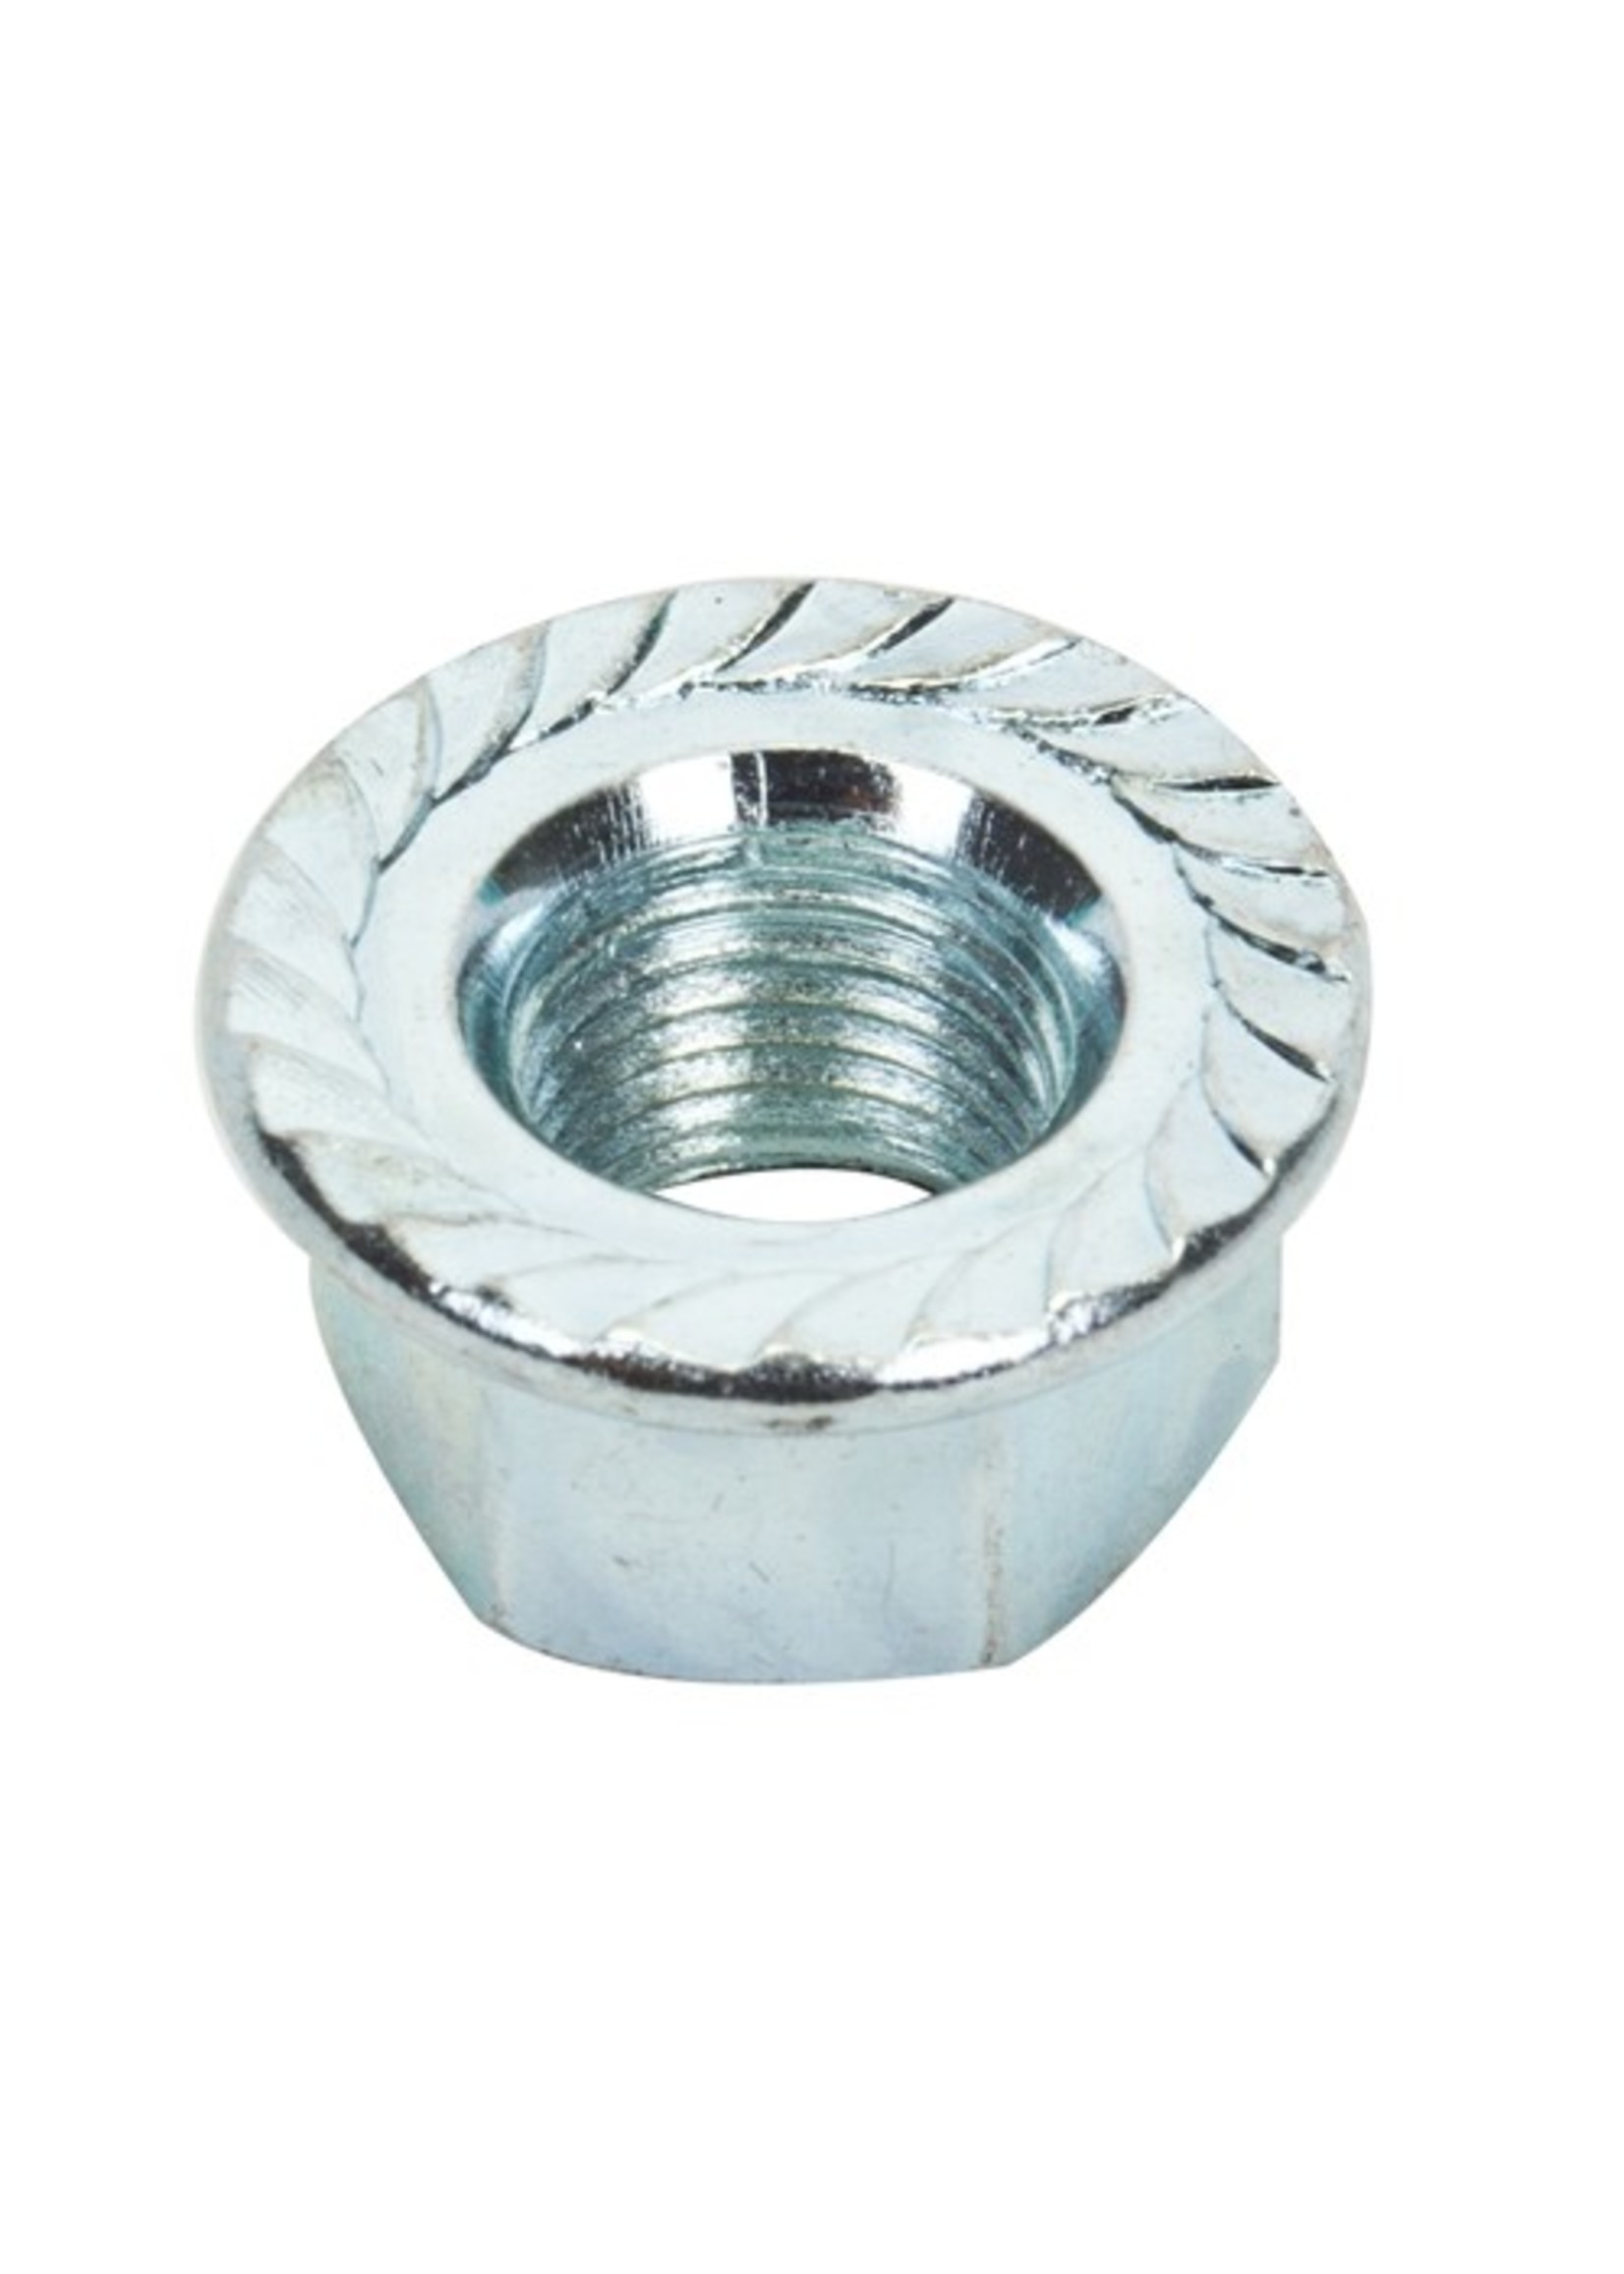 Wheel Master Hub Axle Nuts 3/8 (unit)